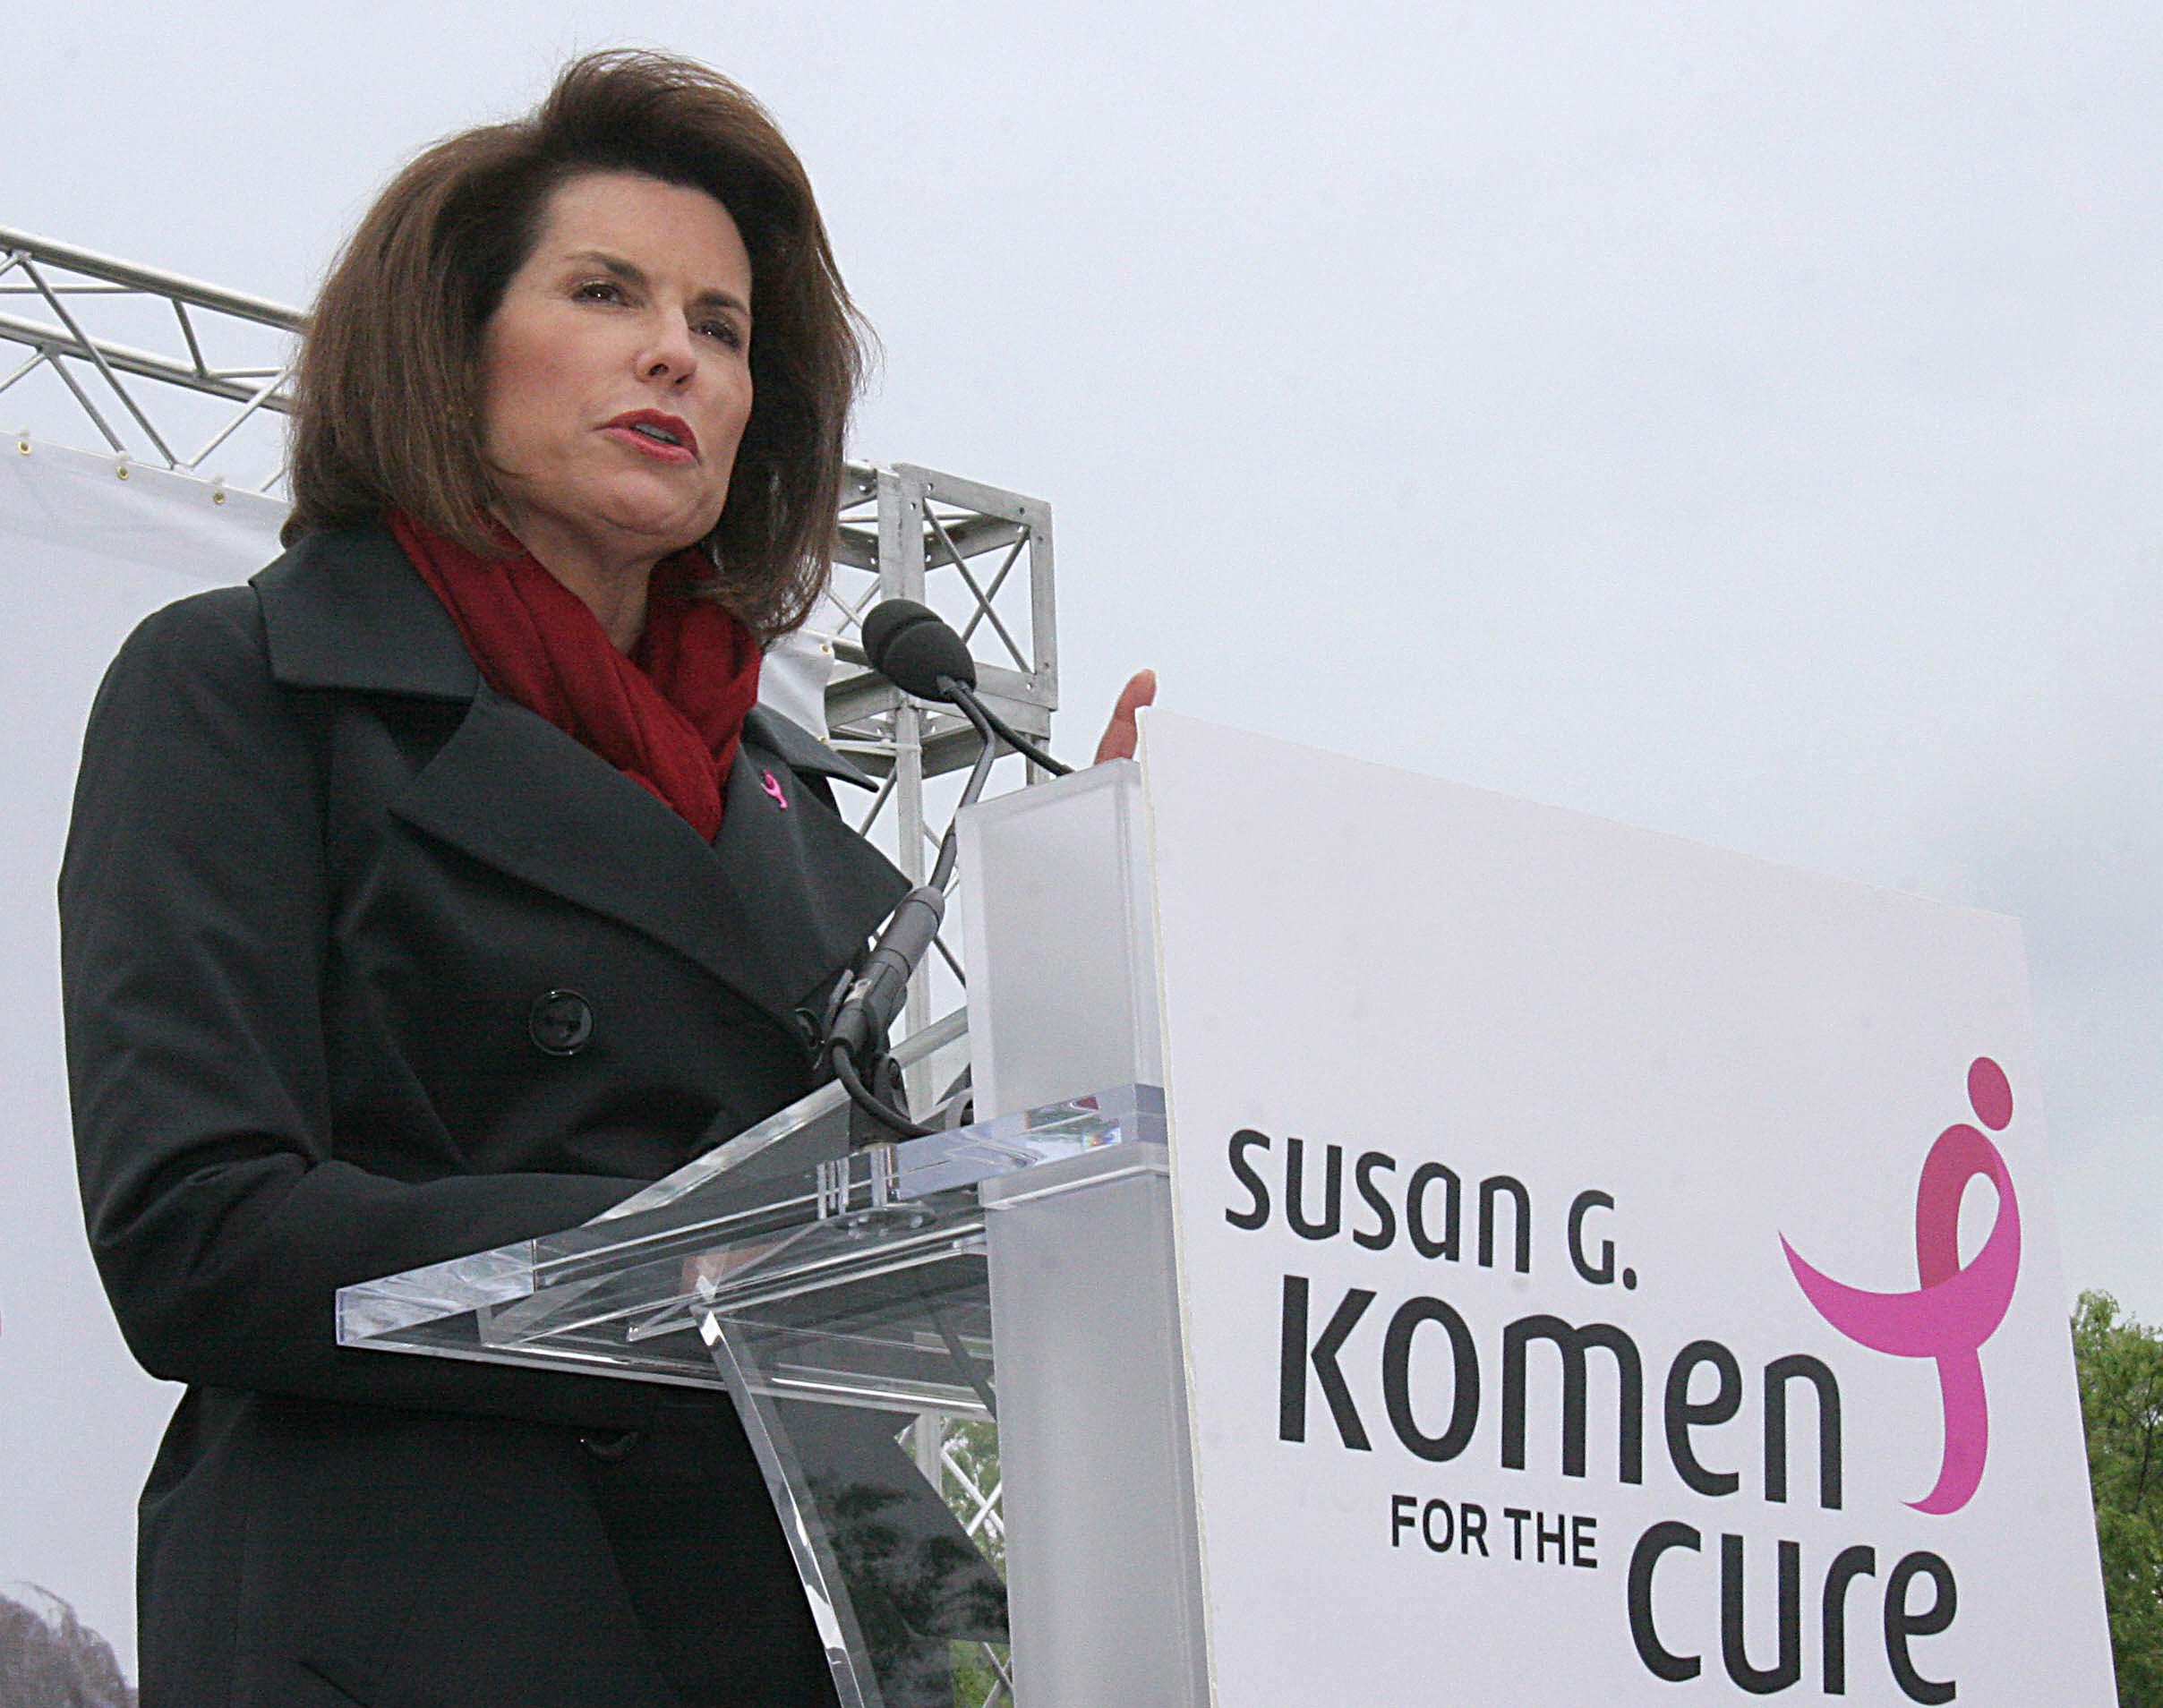 Nancy Brinker with the Susan G. Komen foundation